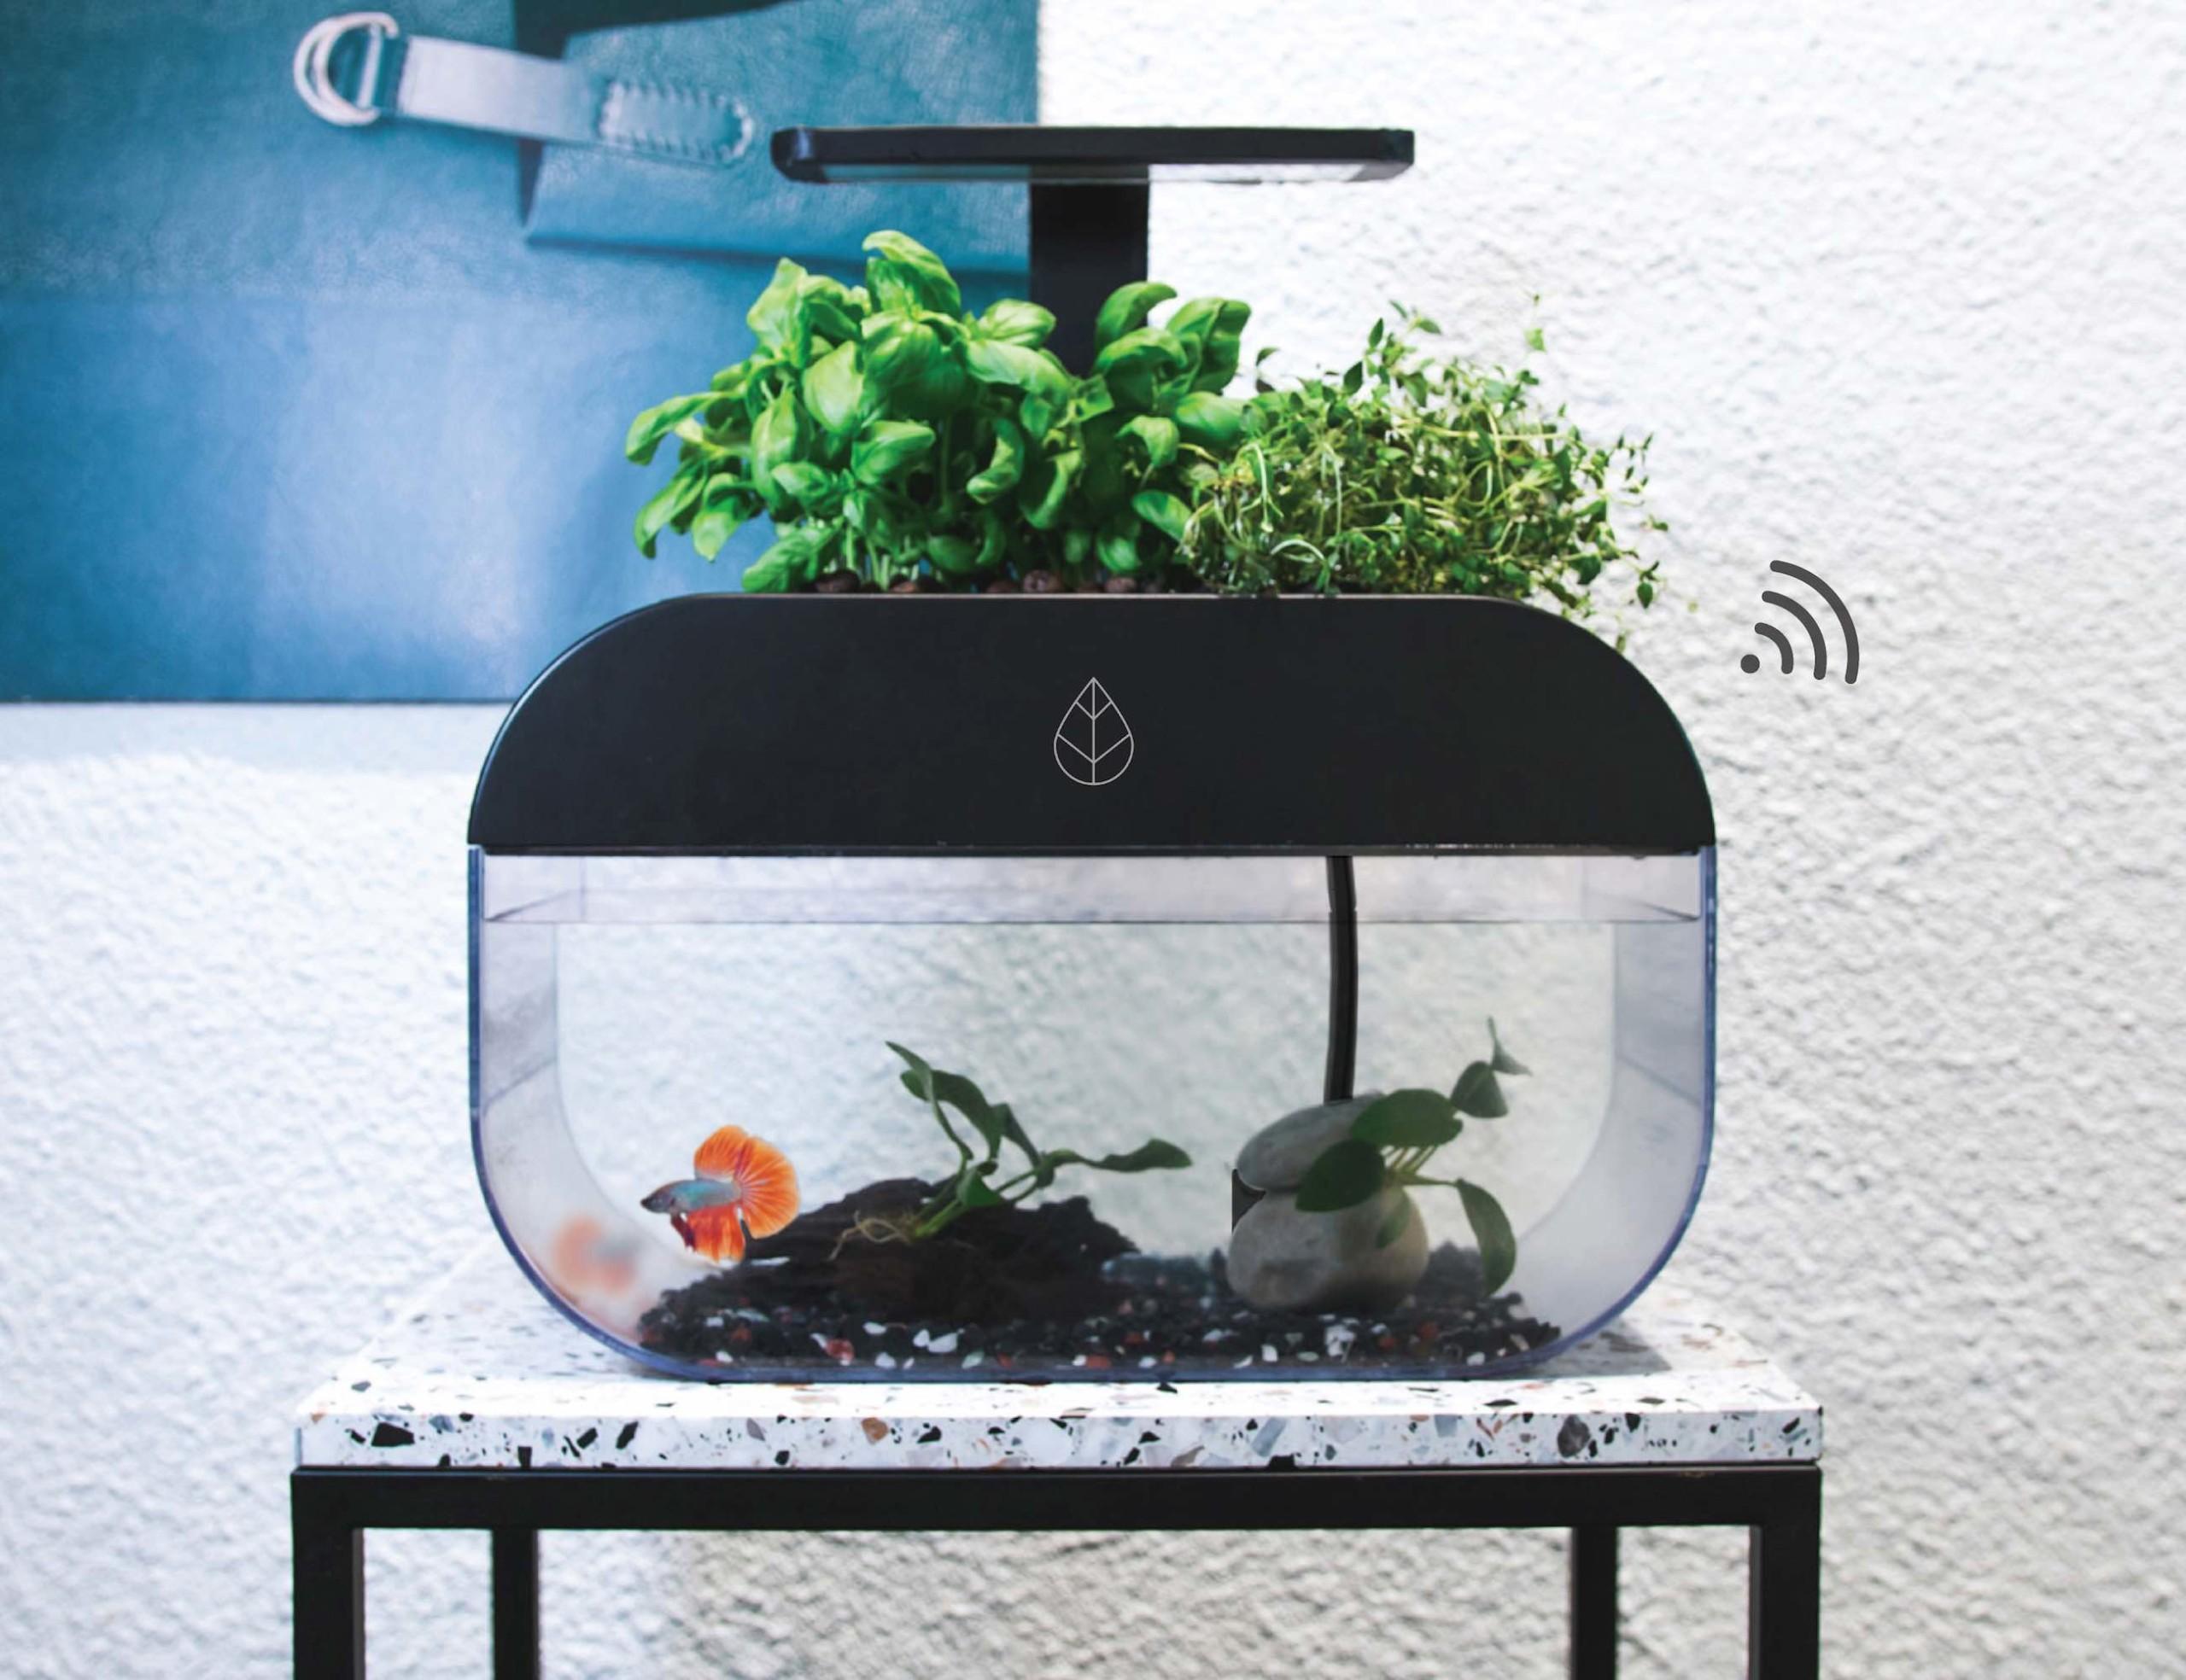 EcoGarden Smart Interactive Ecosystem